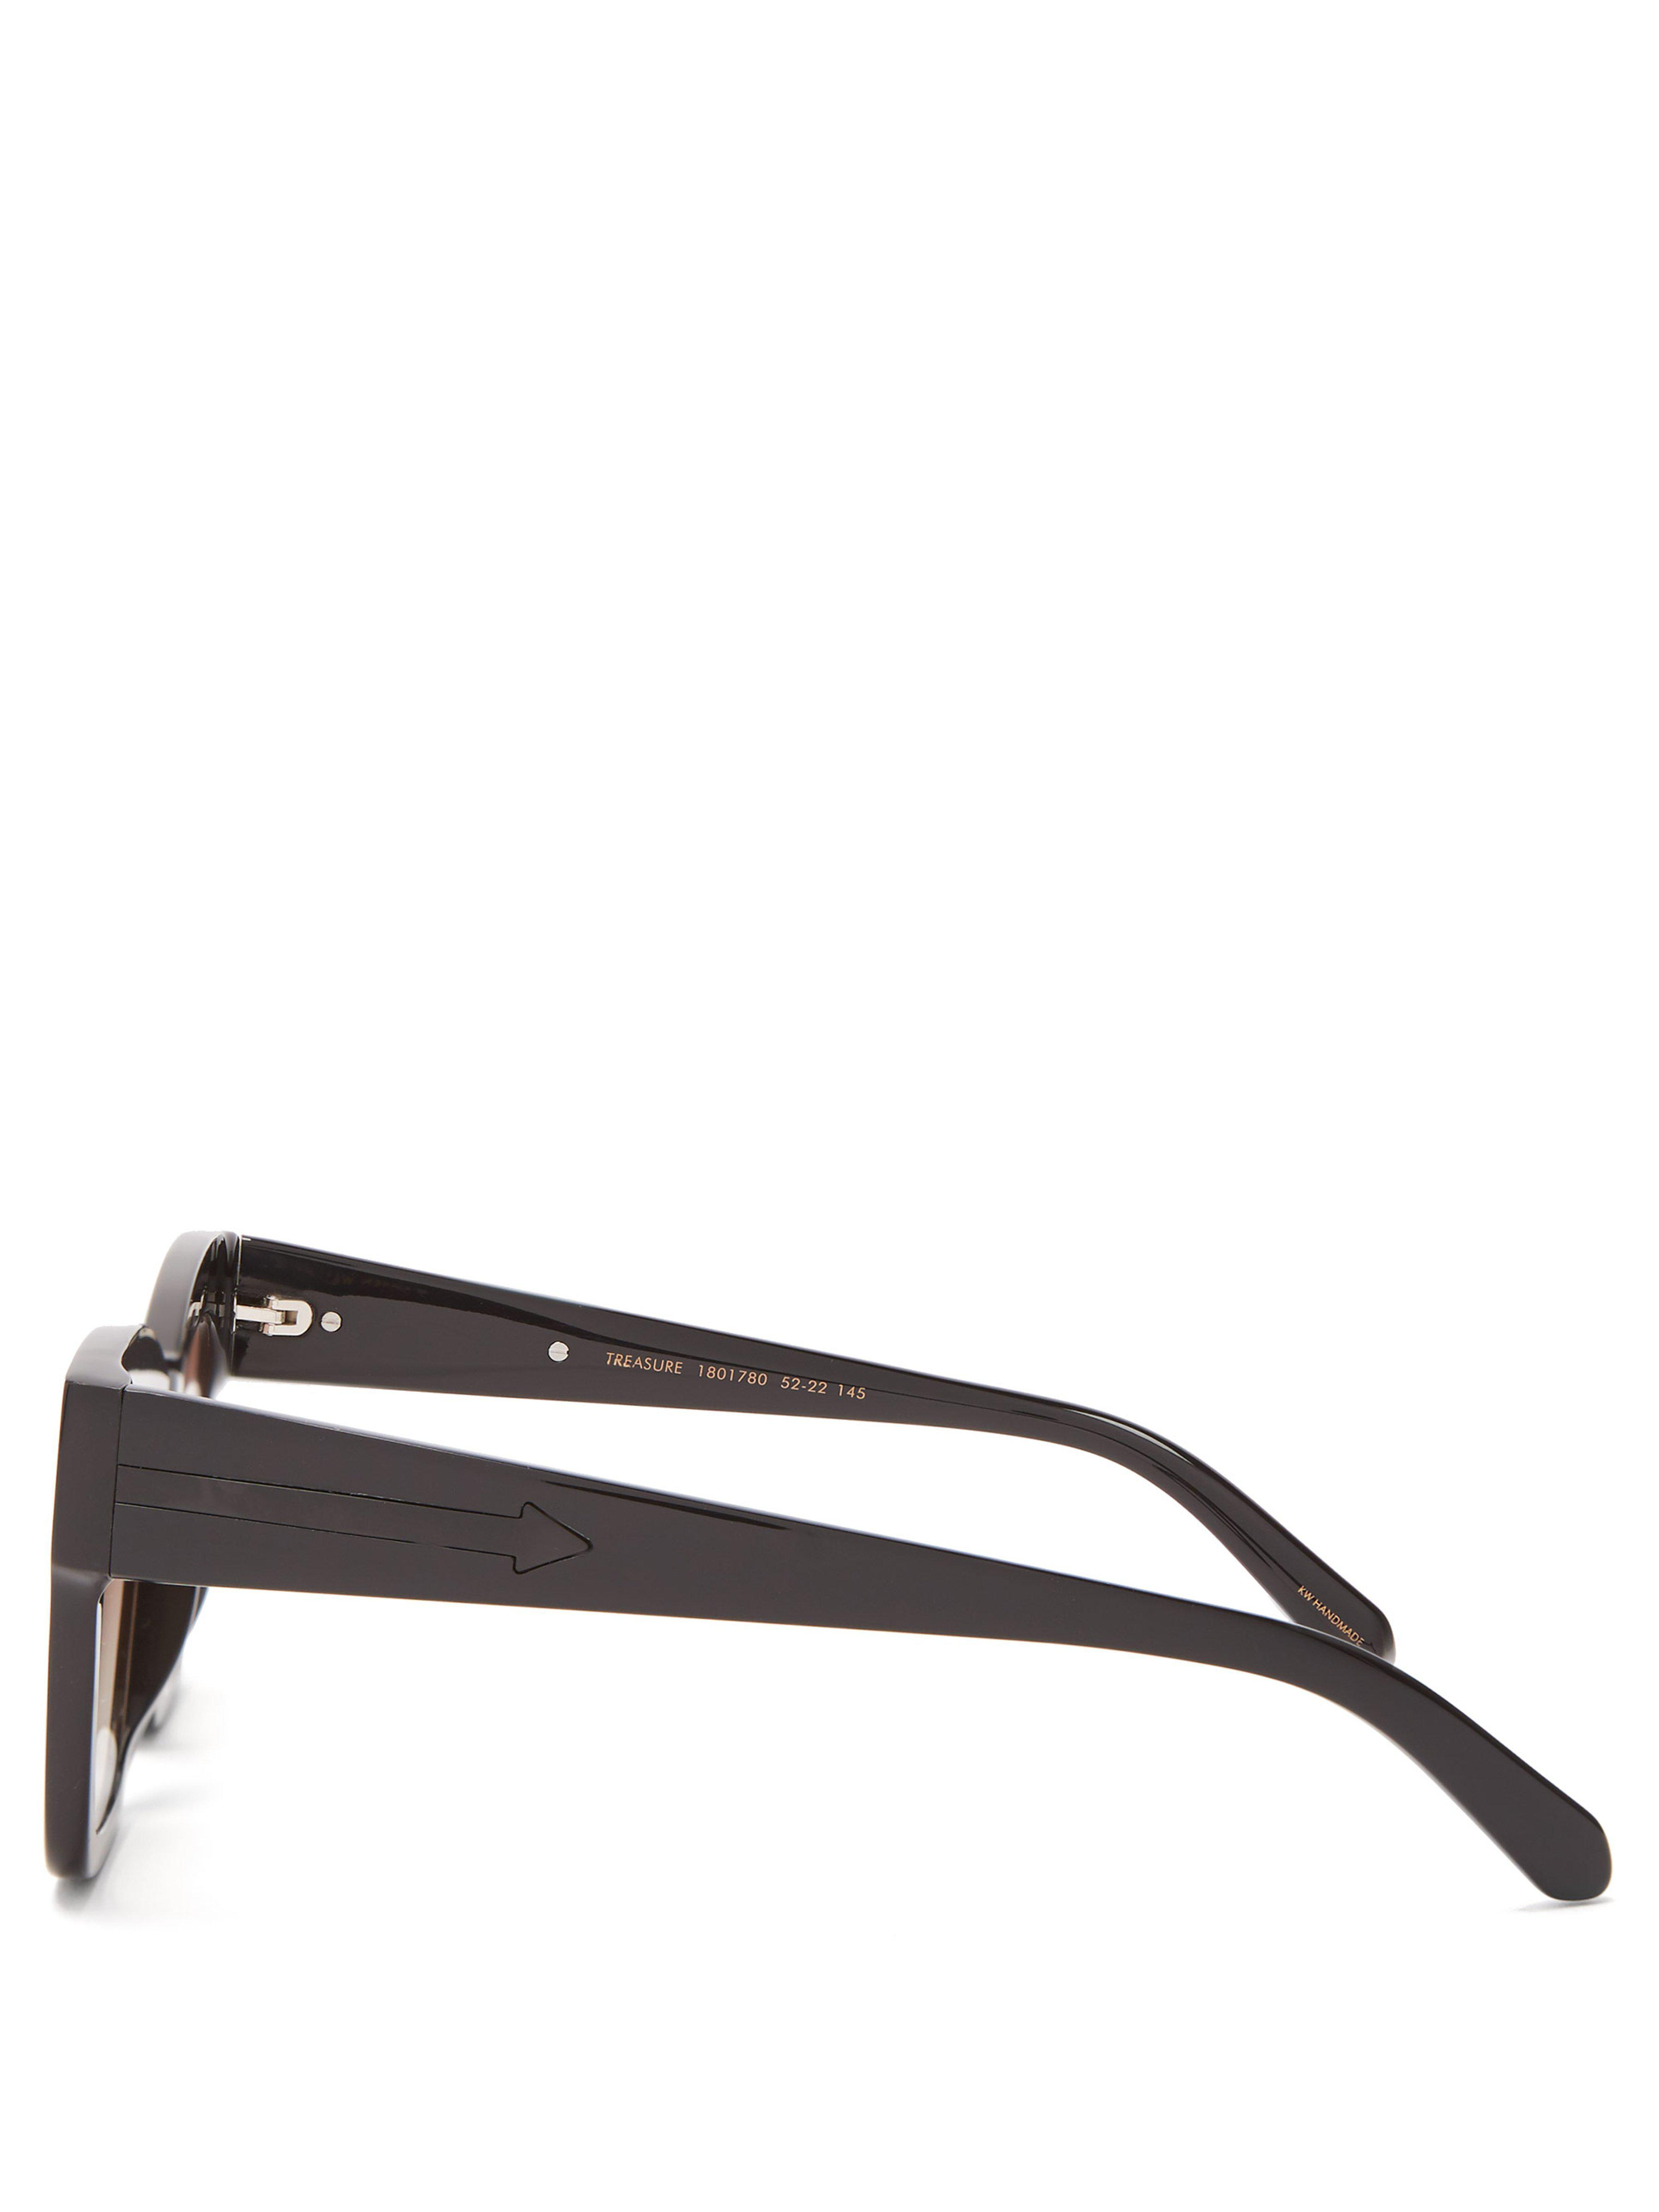 dbd31110a9 Karen Walker Treasure Acetate Cat-eye Sunglasses in Black - Lyst